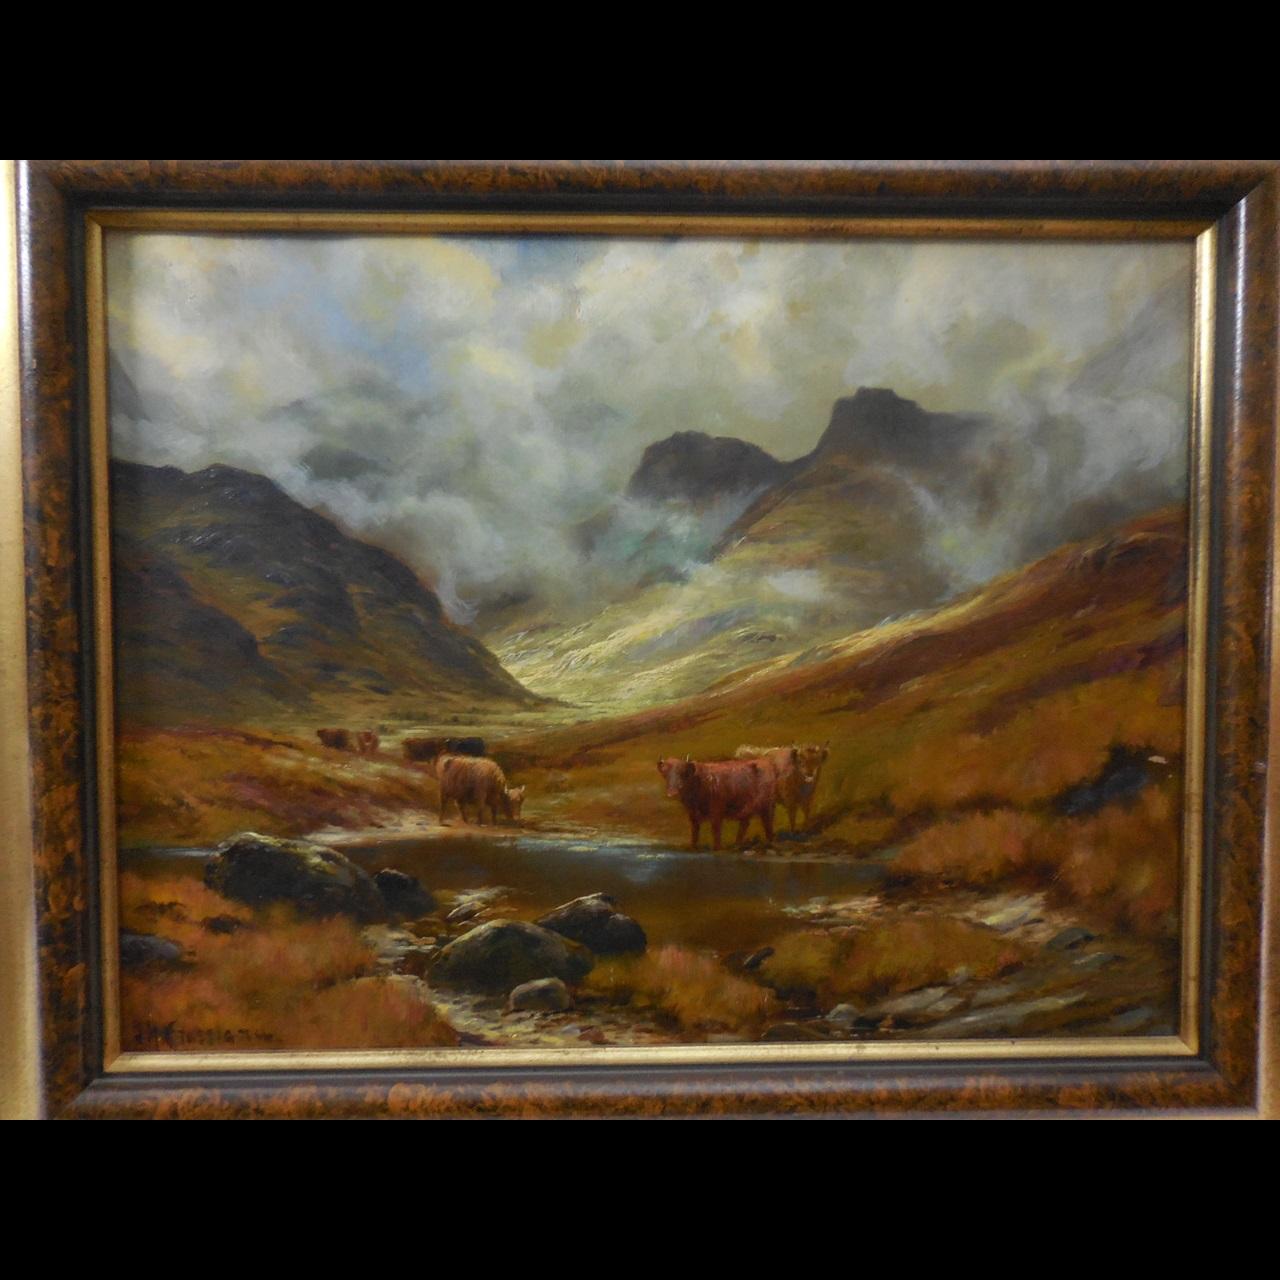 C. 1914 James Henry Crossland Oil on Canvas